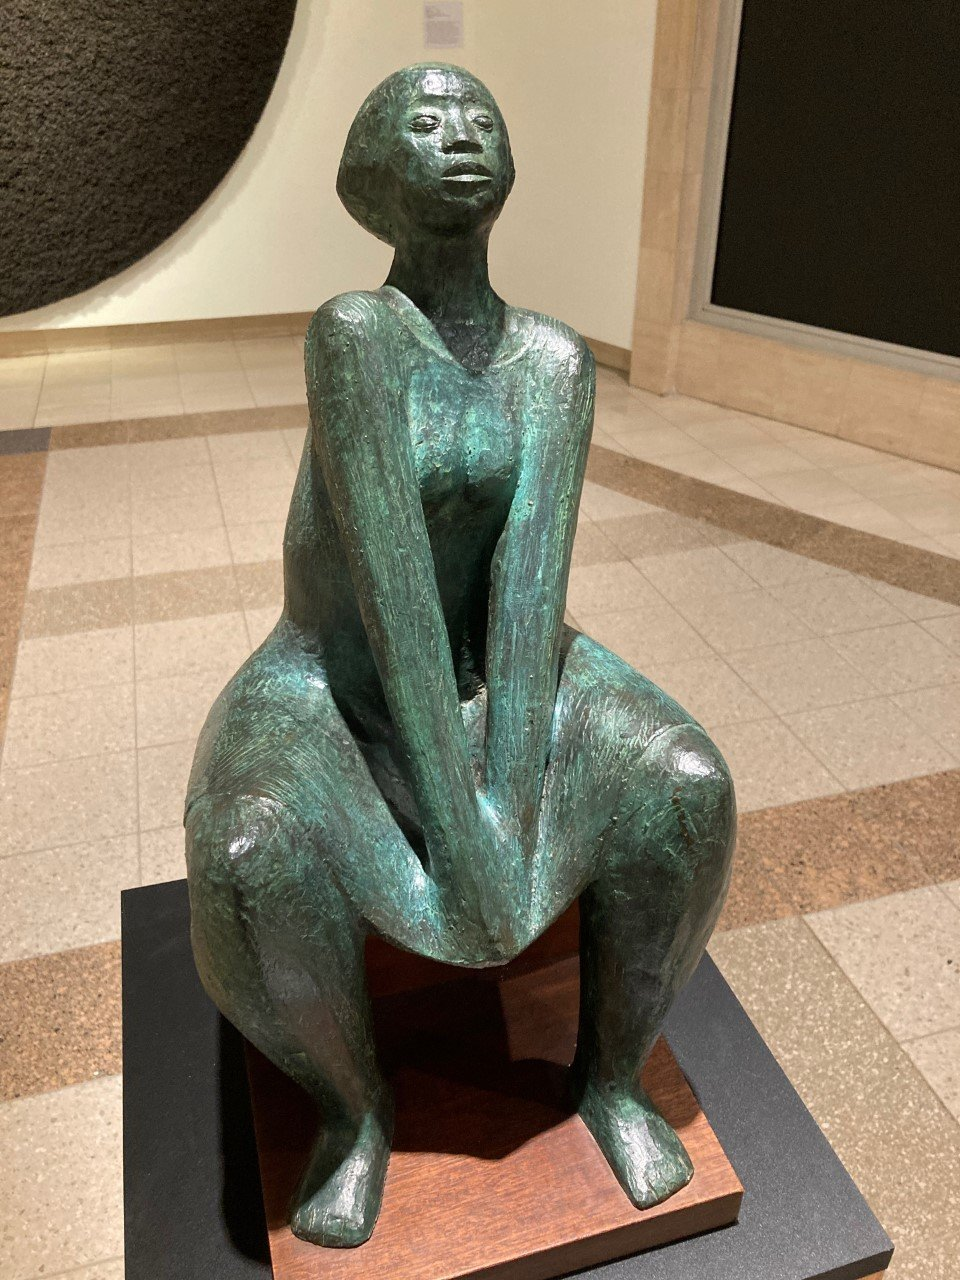 Elizabeth Catlett, (American, 1915-2012), 'Seated Woman,' c. 1961-1971, bronze.